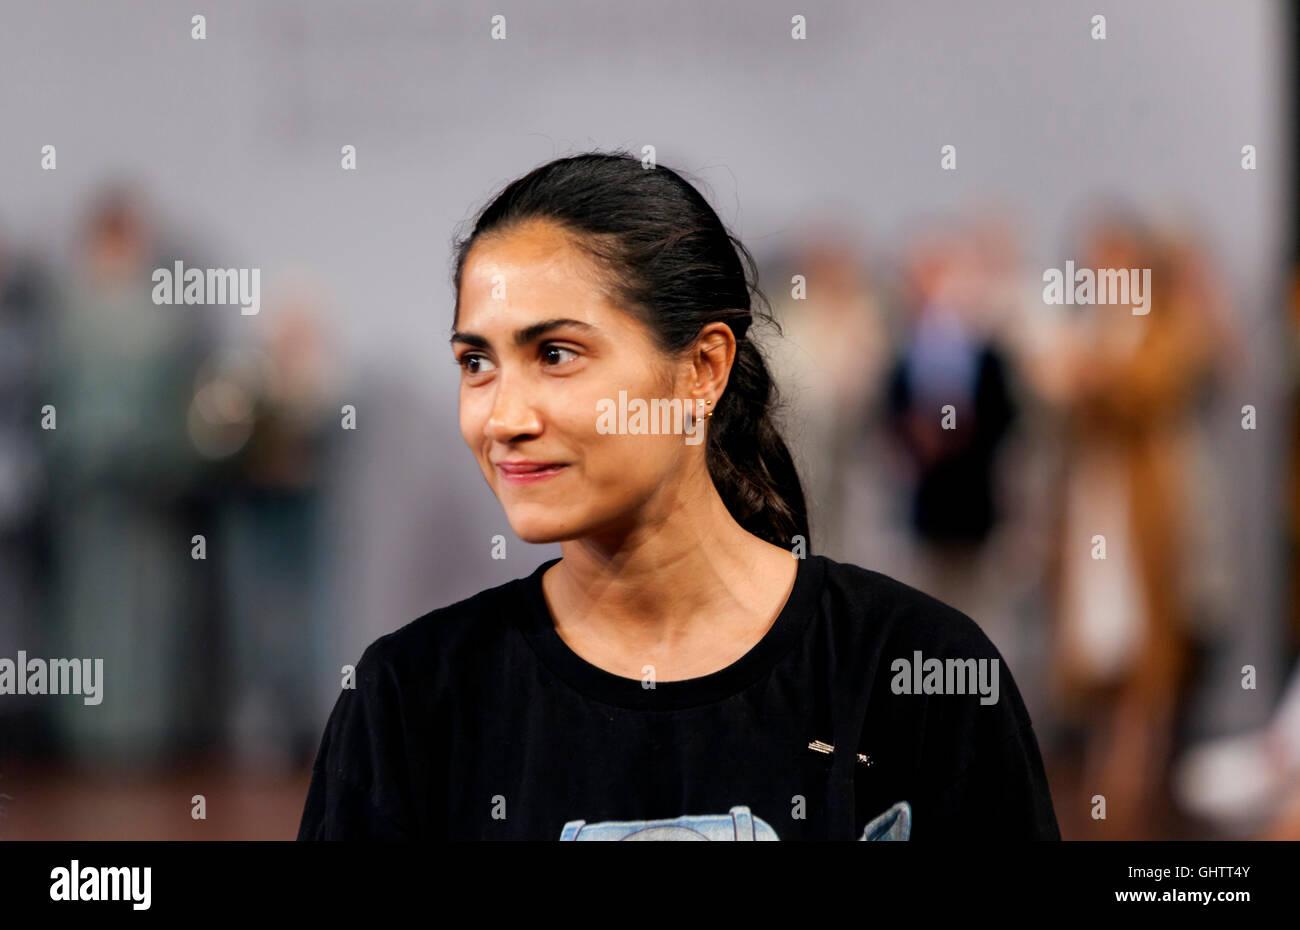 Kopenhagen, Dänemark, 10. August 2016: Shila Louise Gaonkar gewinnt Designer Nest-Preis für junge Talente Stockbild